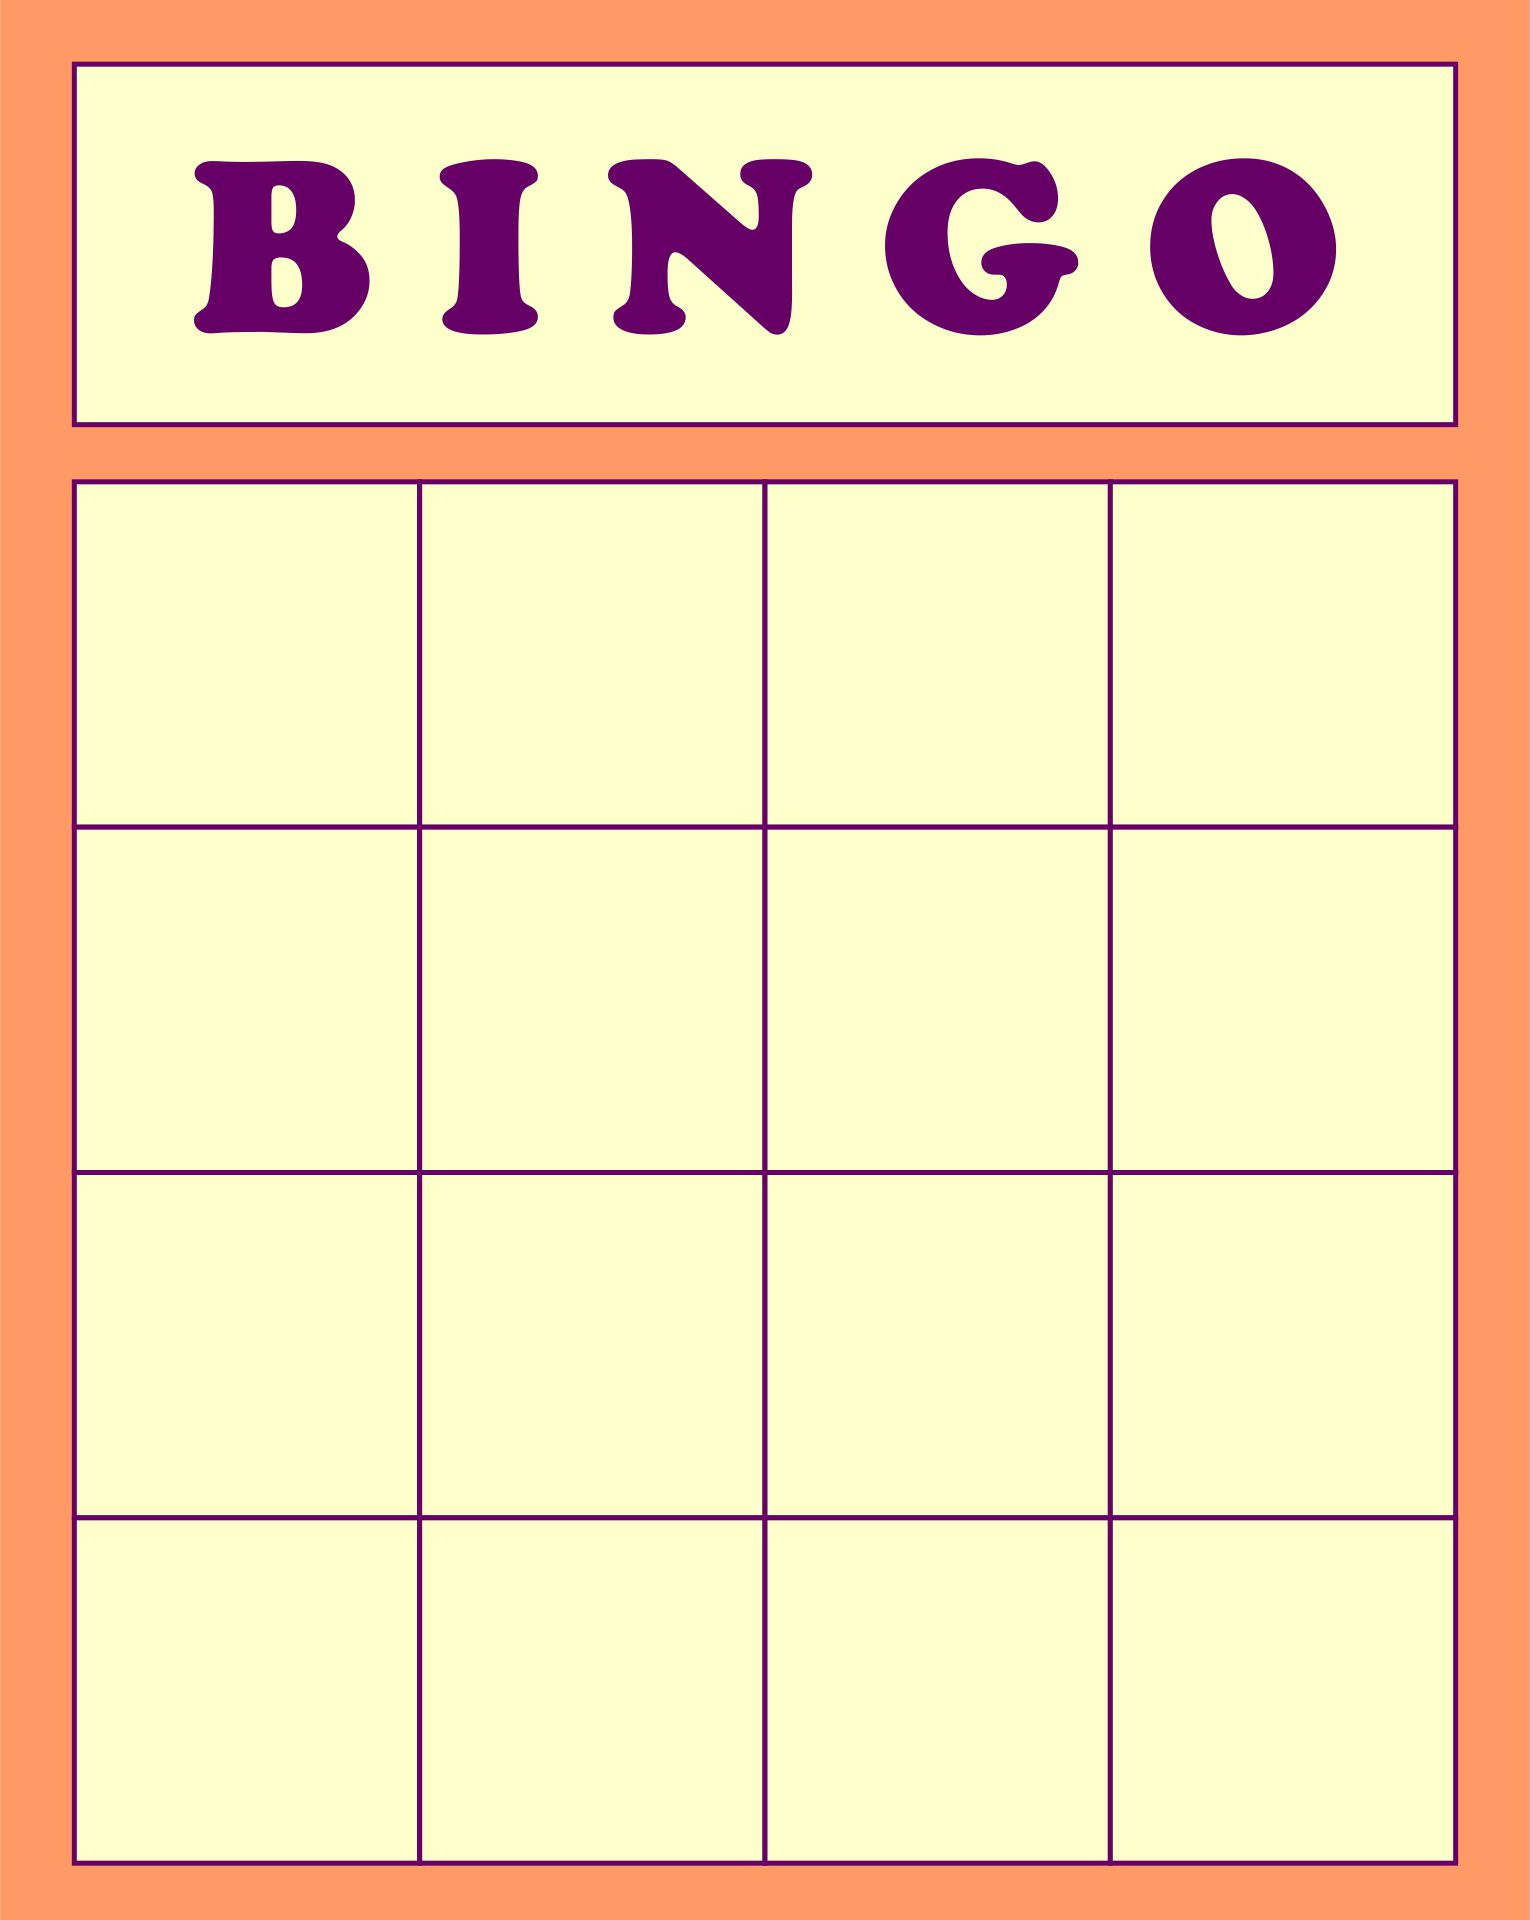 21 Best Printable Human Bingo Templates - printablee.com Inside Blank Bingo Card Template Microsoft Word